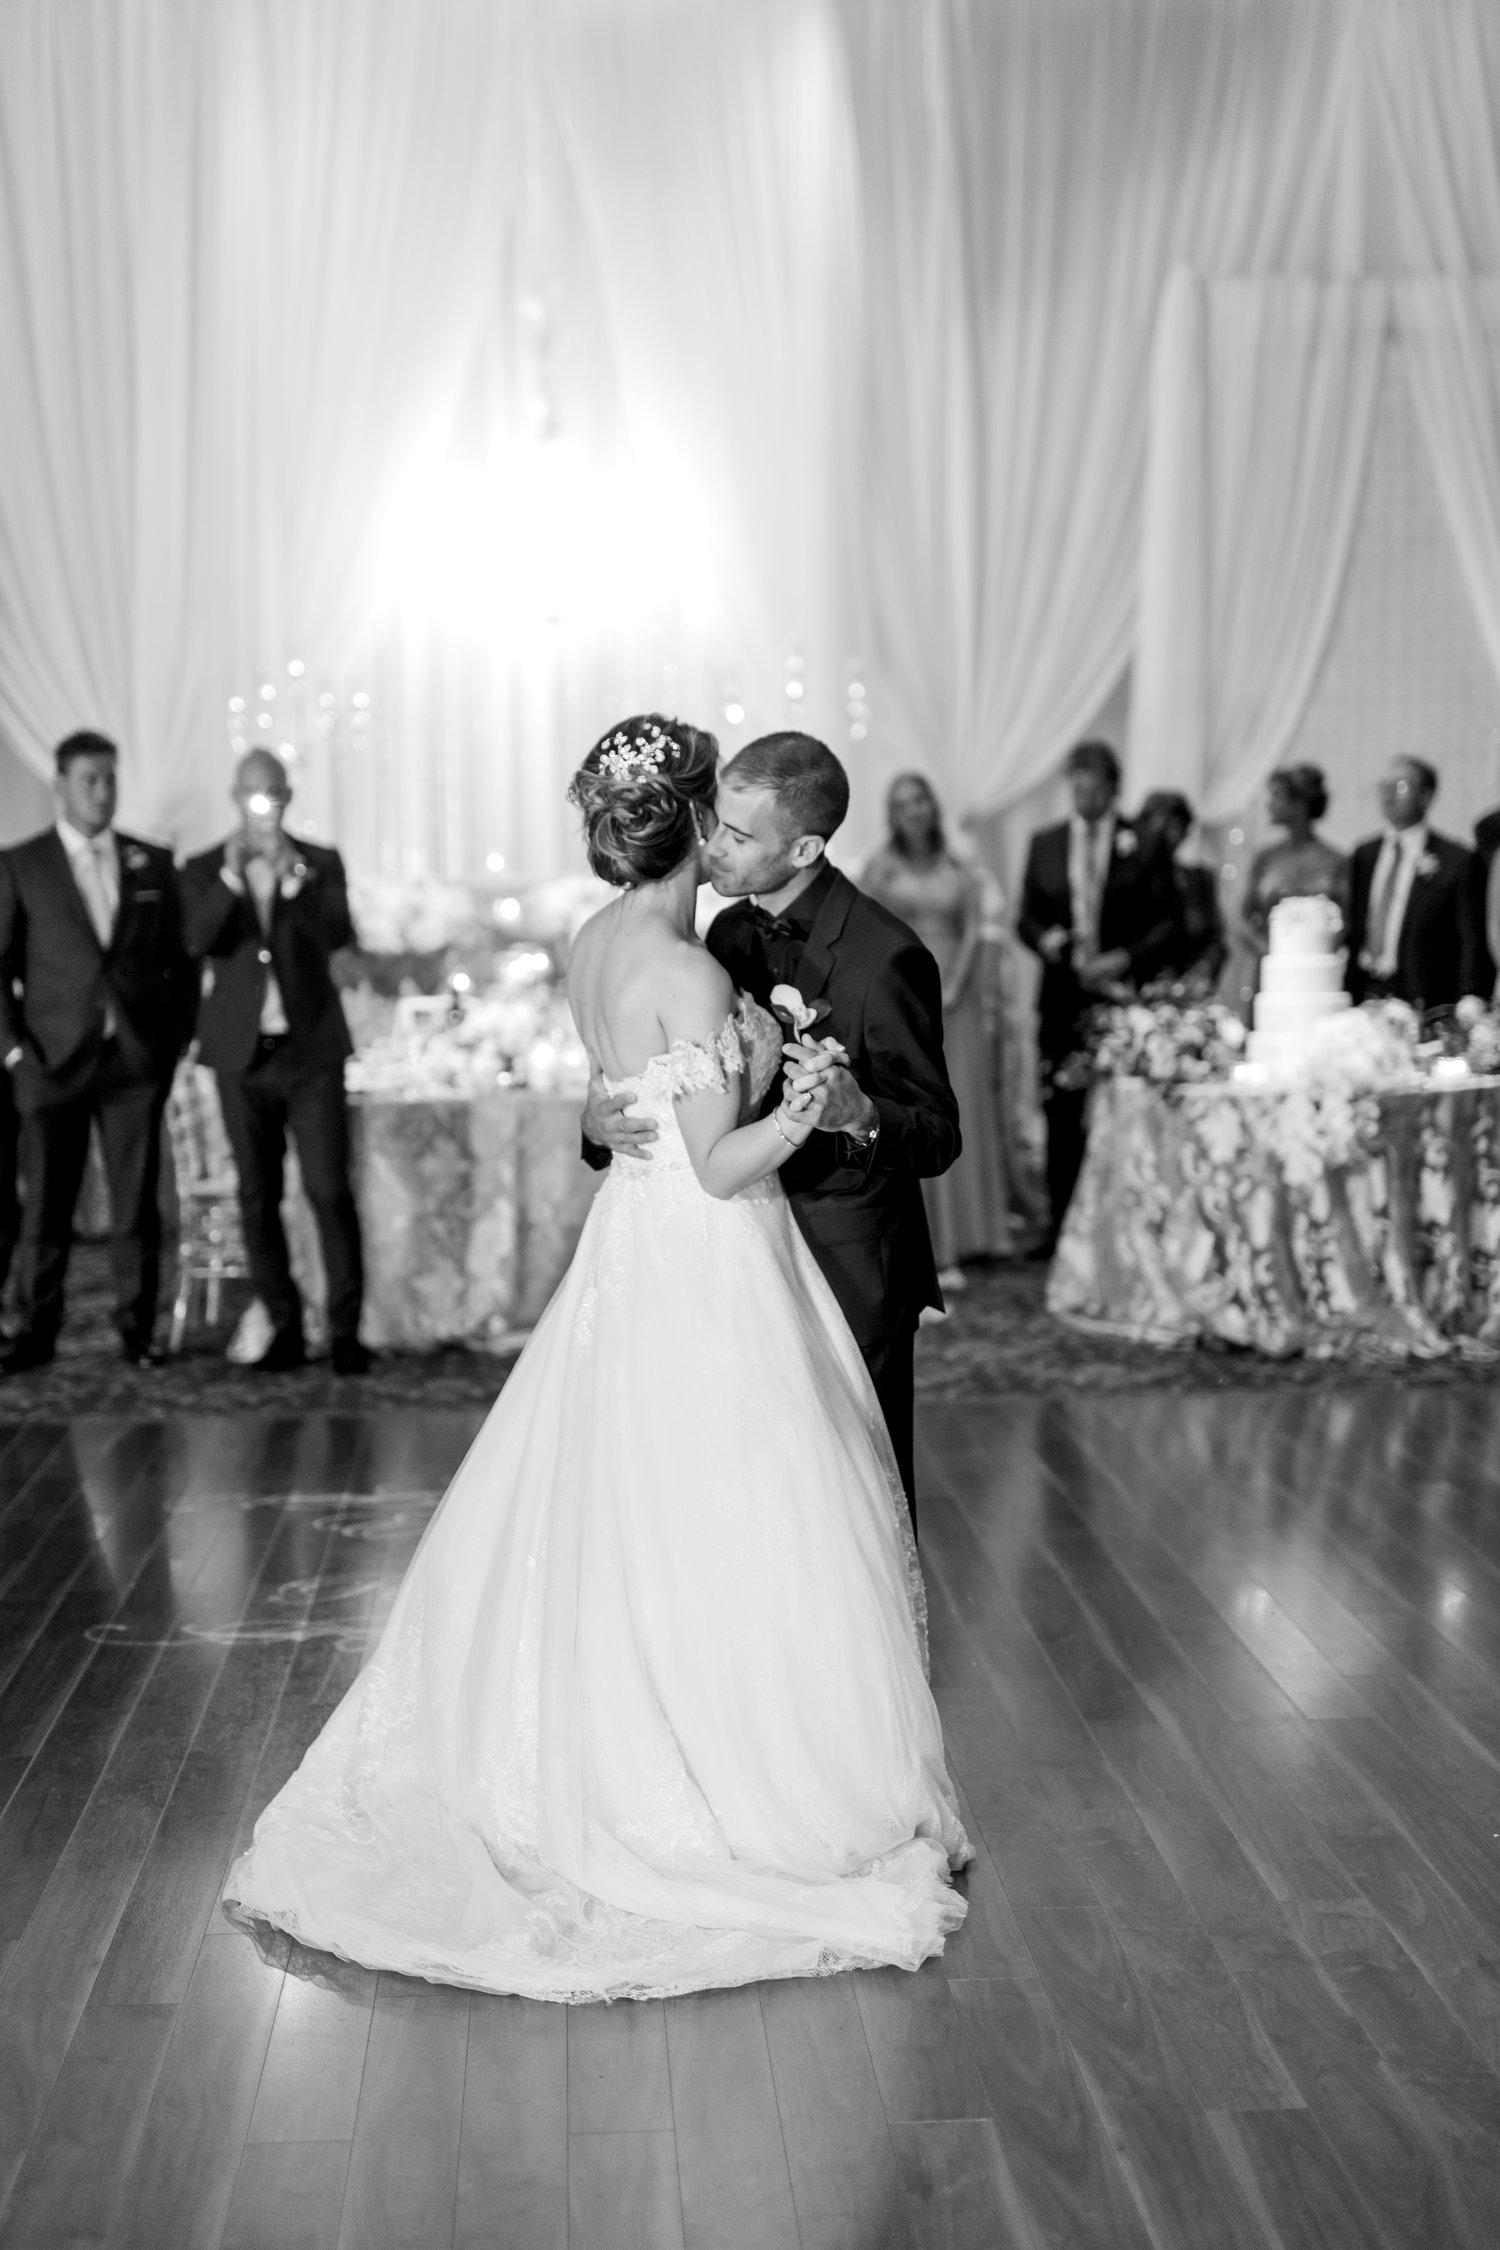 Danielle-Giroux-Amir-Golbazi-Toronto-Wedding-Photographer-Bellvue-Manor_DeLuca_2-357.jpg